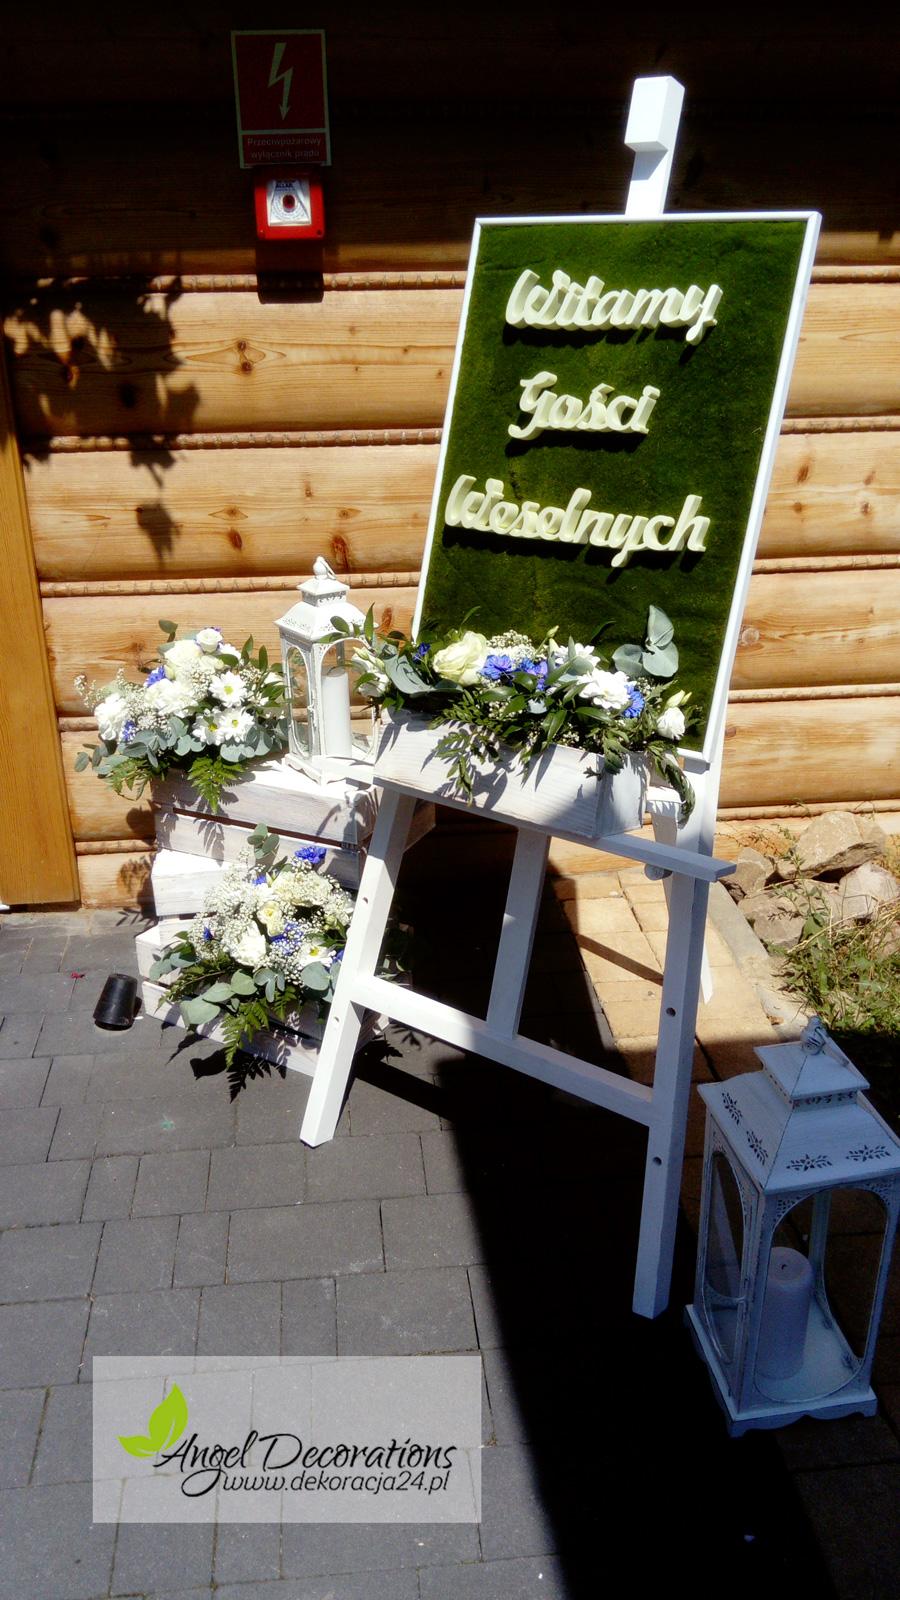 angeldecorations-dekoracje-tablica-lampiony